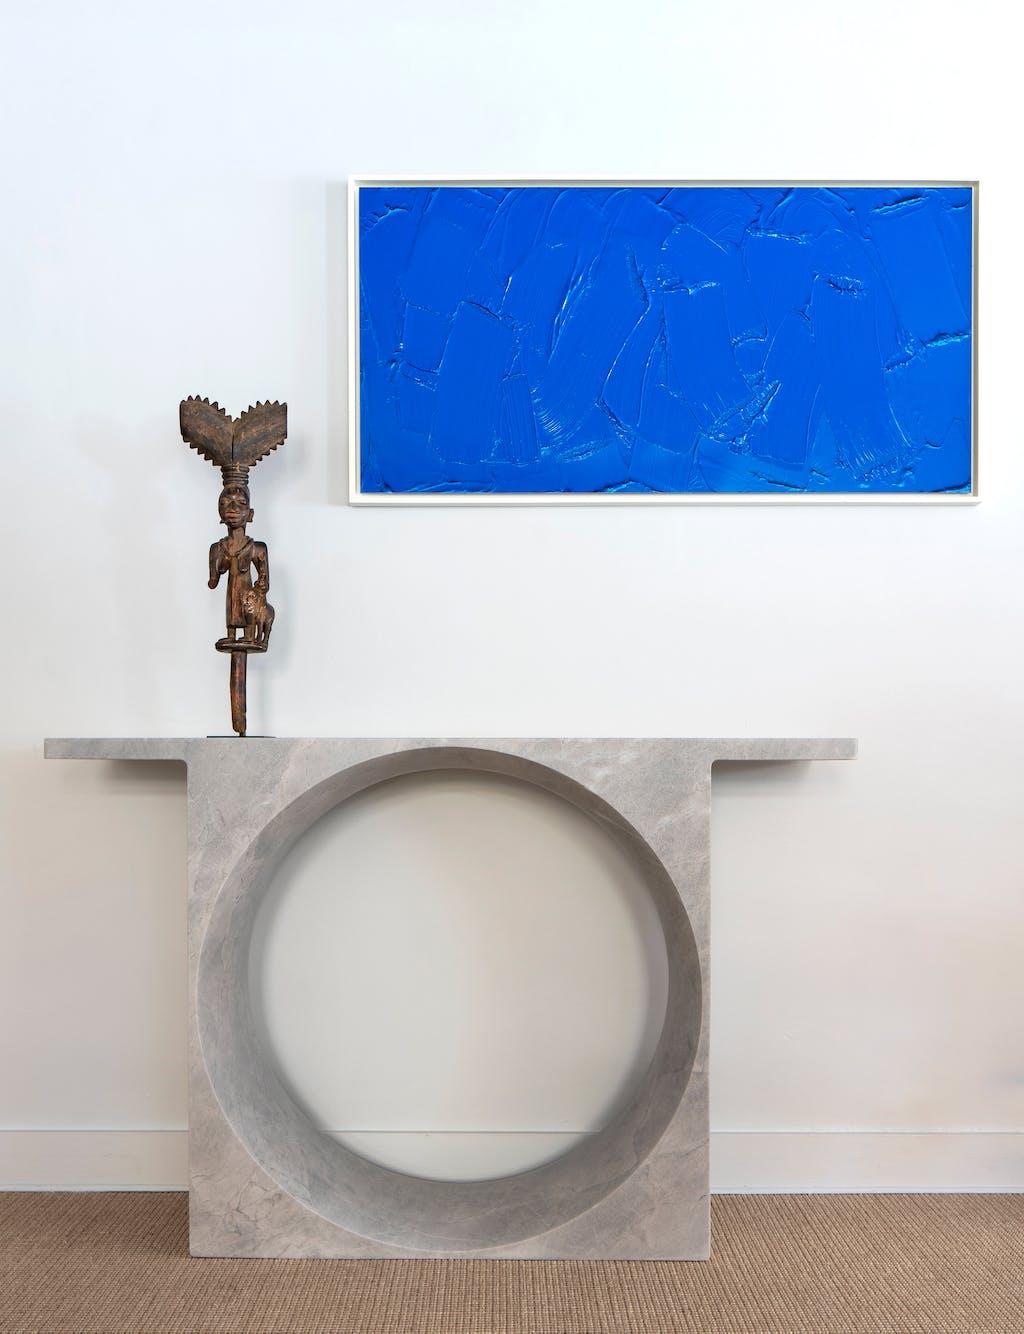 Lucas Ratton x kamel mennour x Galerie kreo x Galerie Jacques Lacoste - © kamel mennour